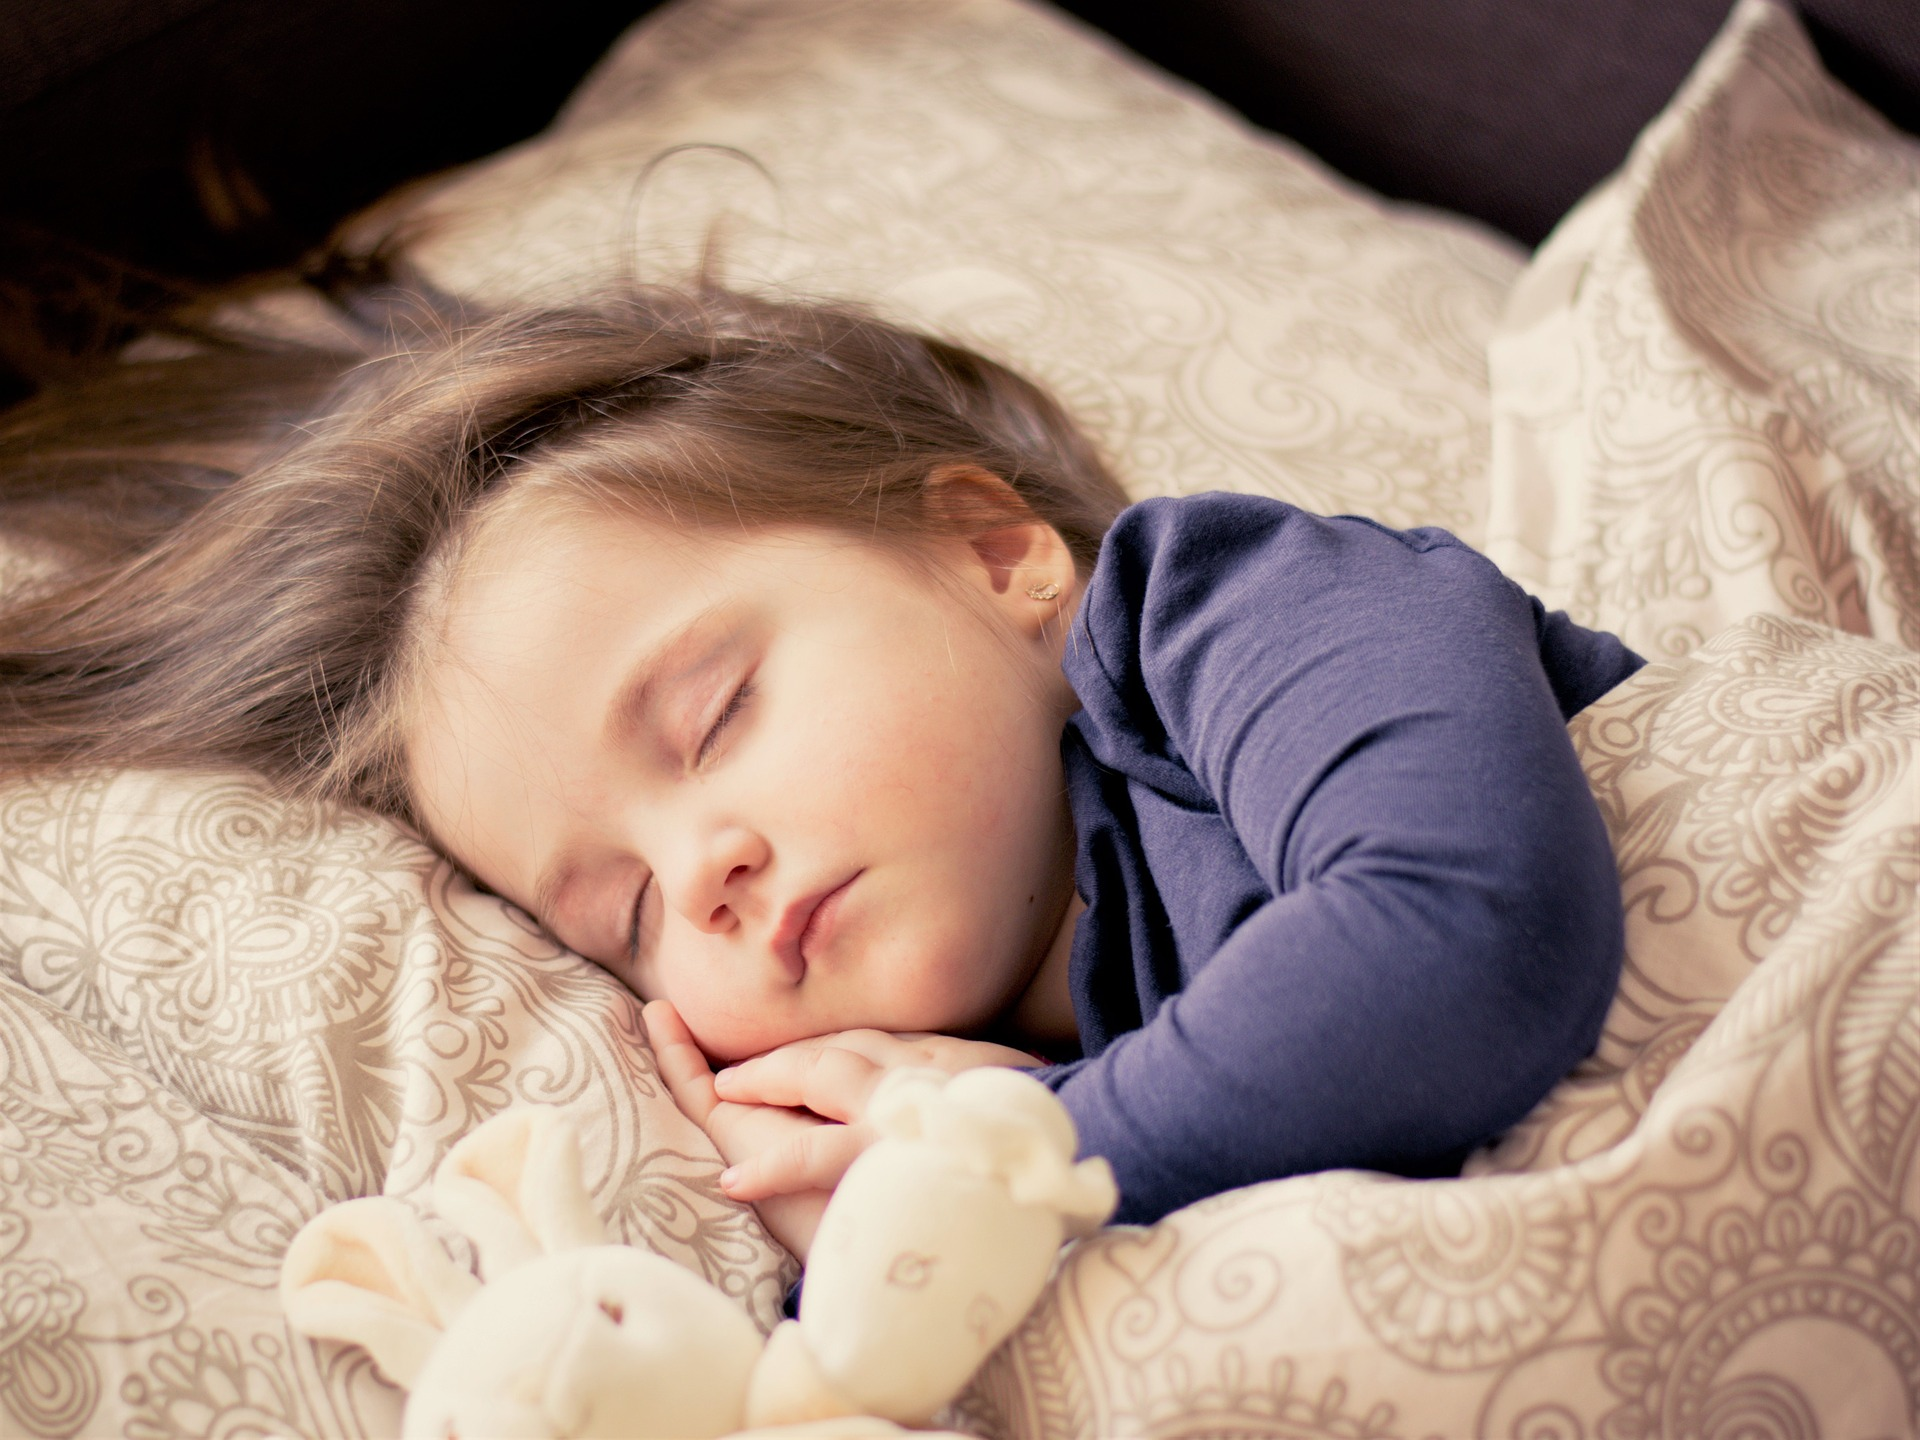 How to Get the Sleep You Need